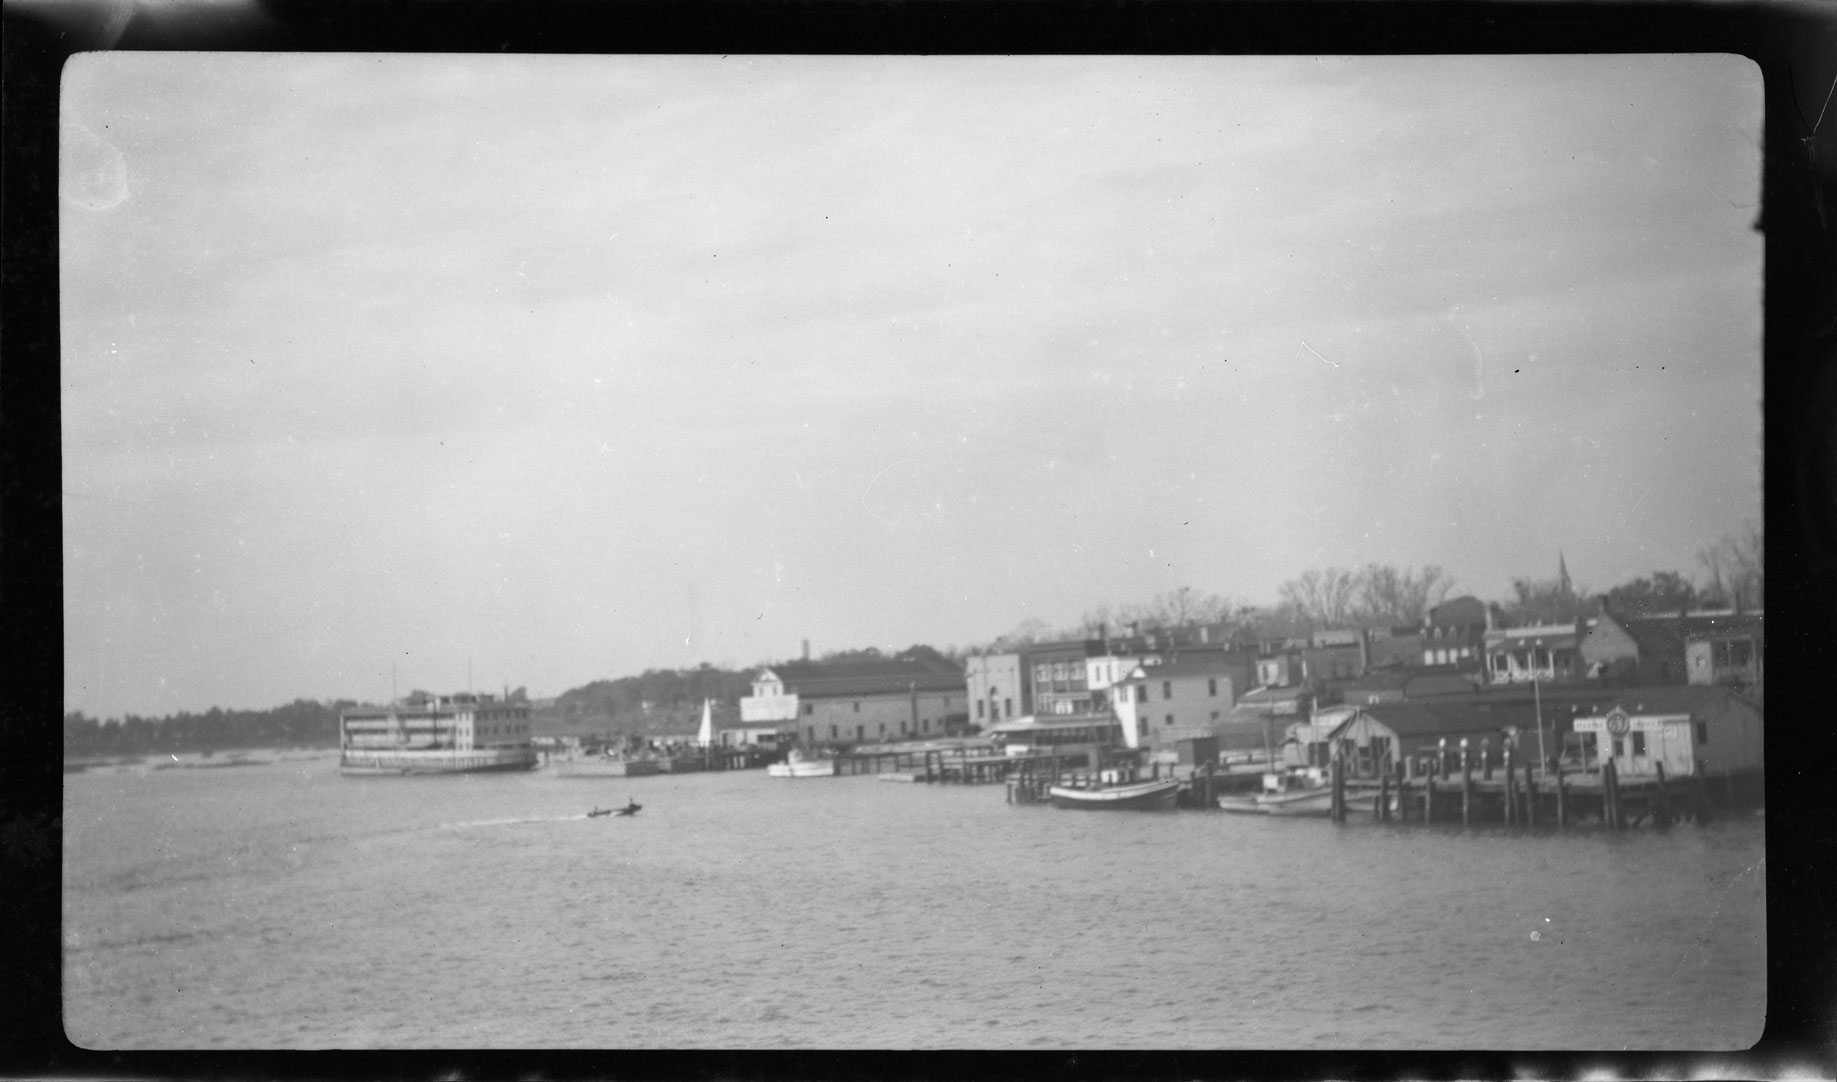 Beaufort Waterfront